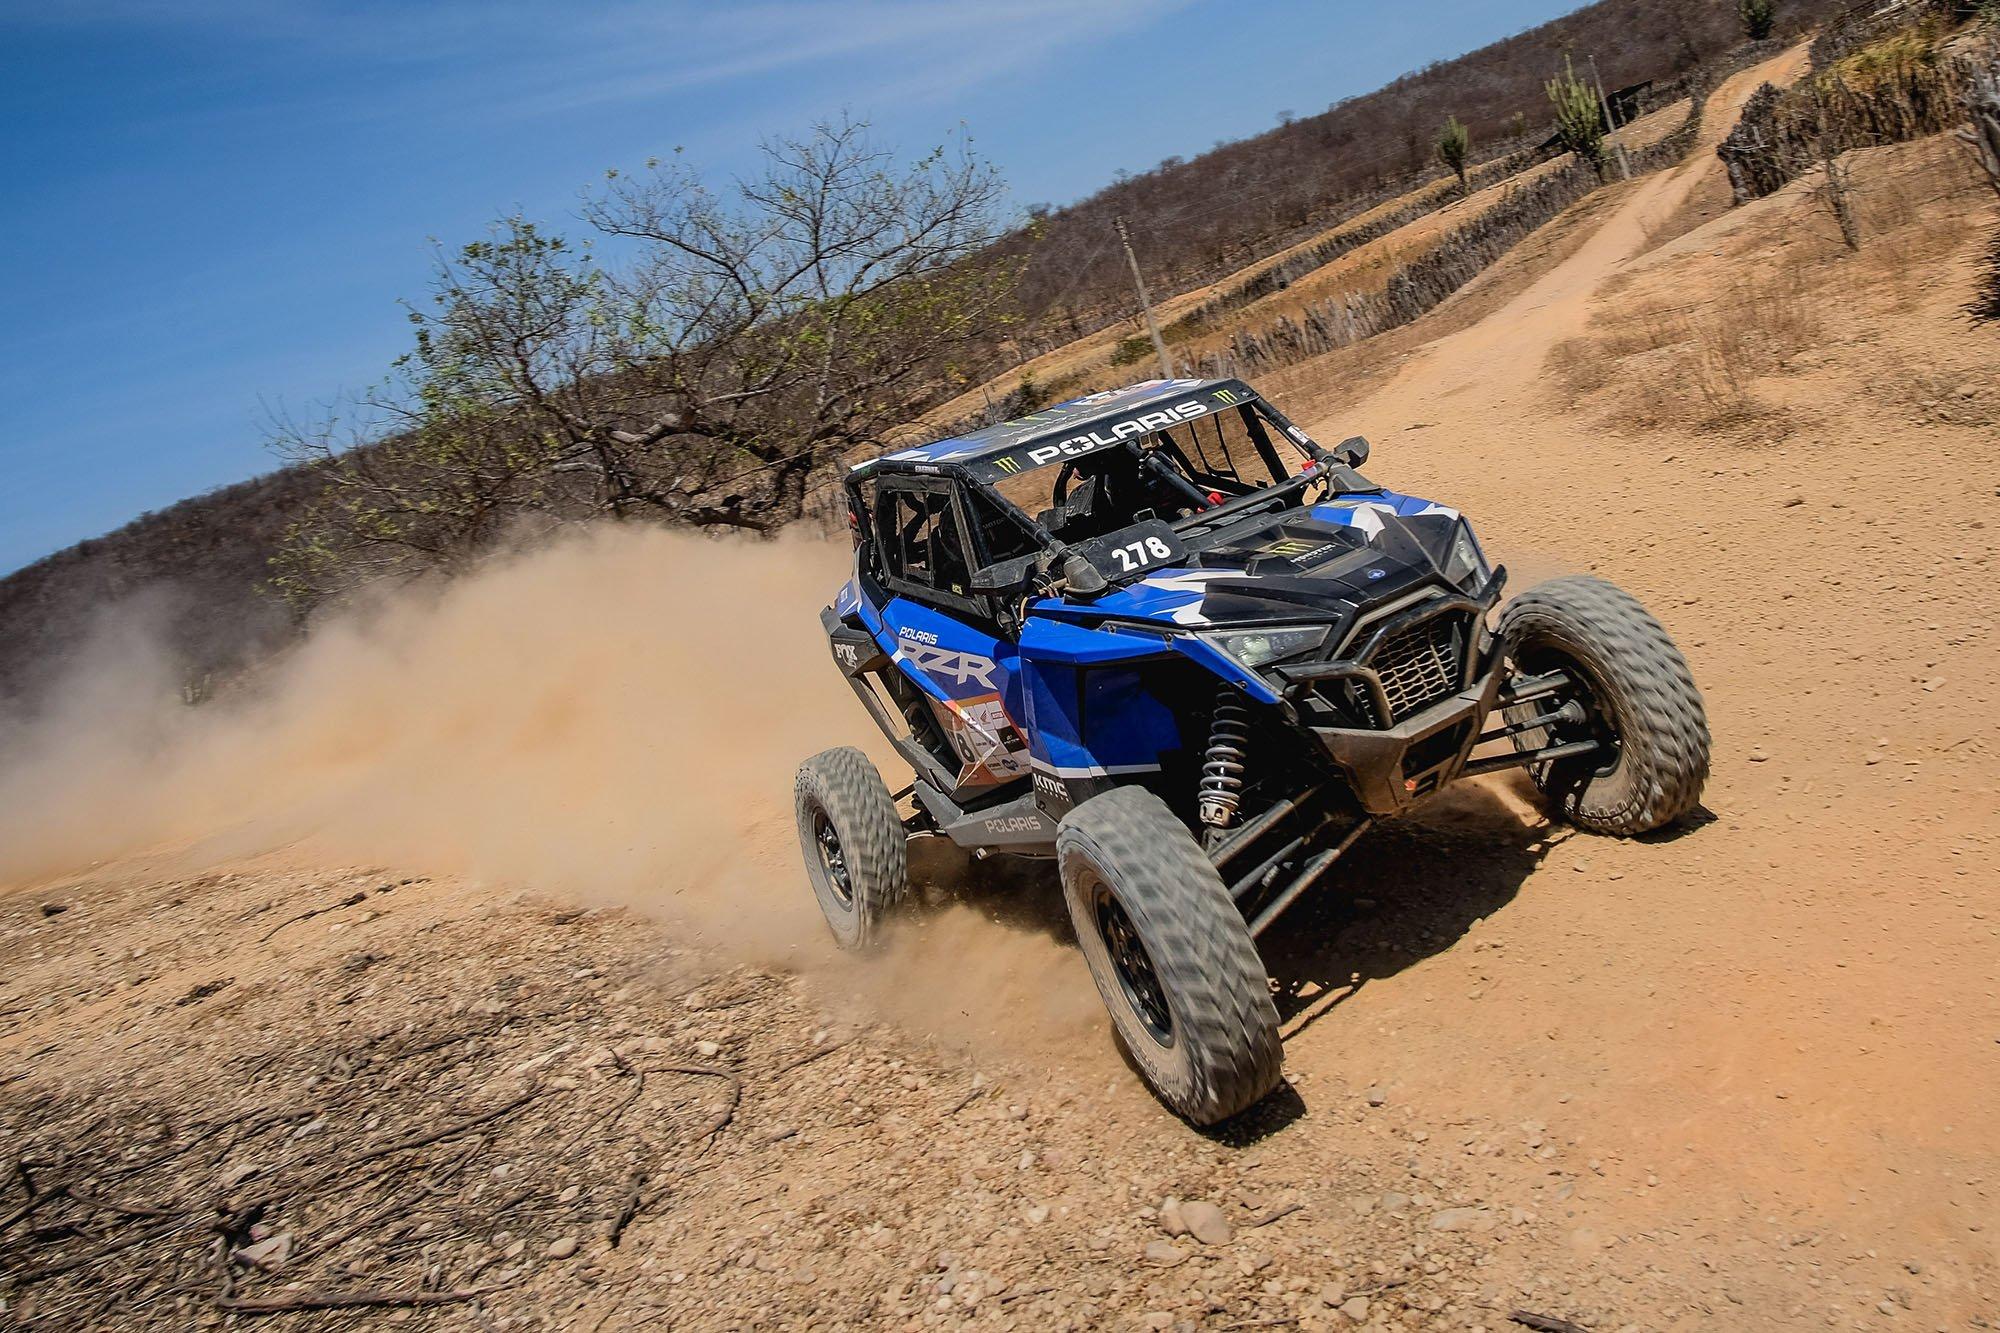 2021_Casey-Currie_Sertoes-Rally_Brazil_PolarisRZR_Stage5_002.jpg